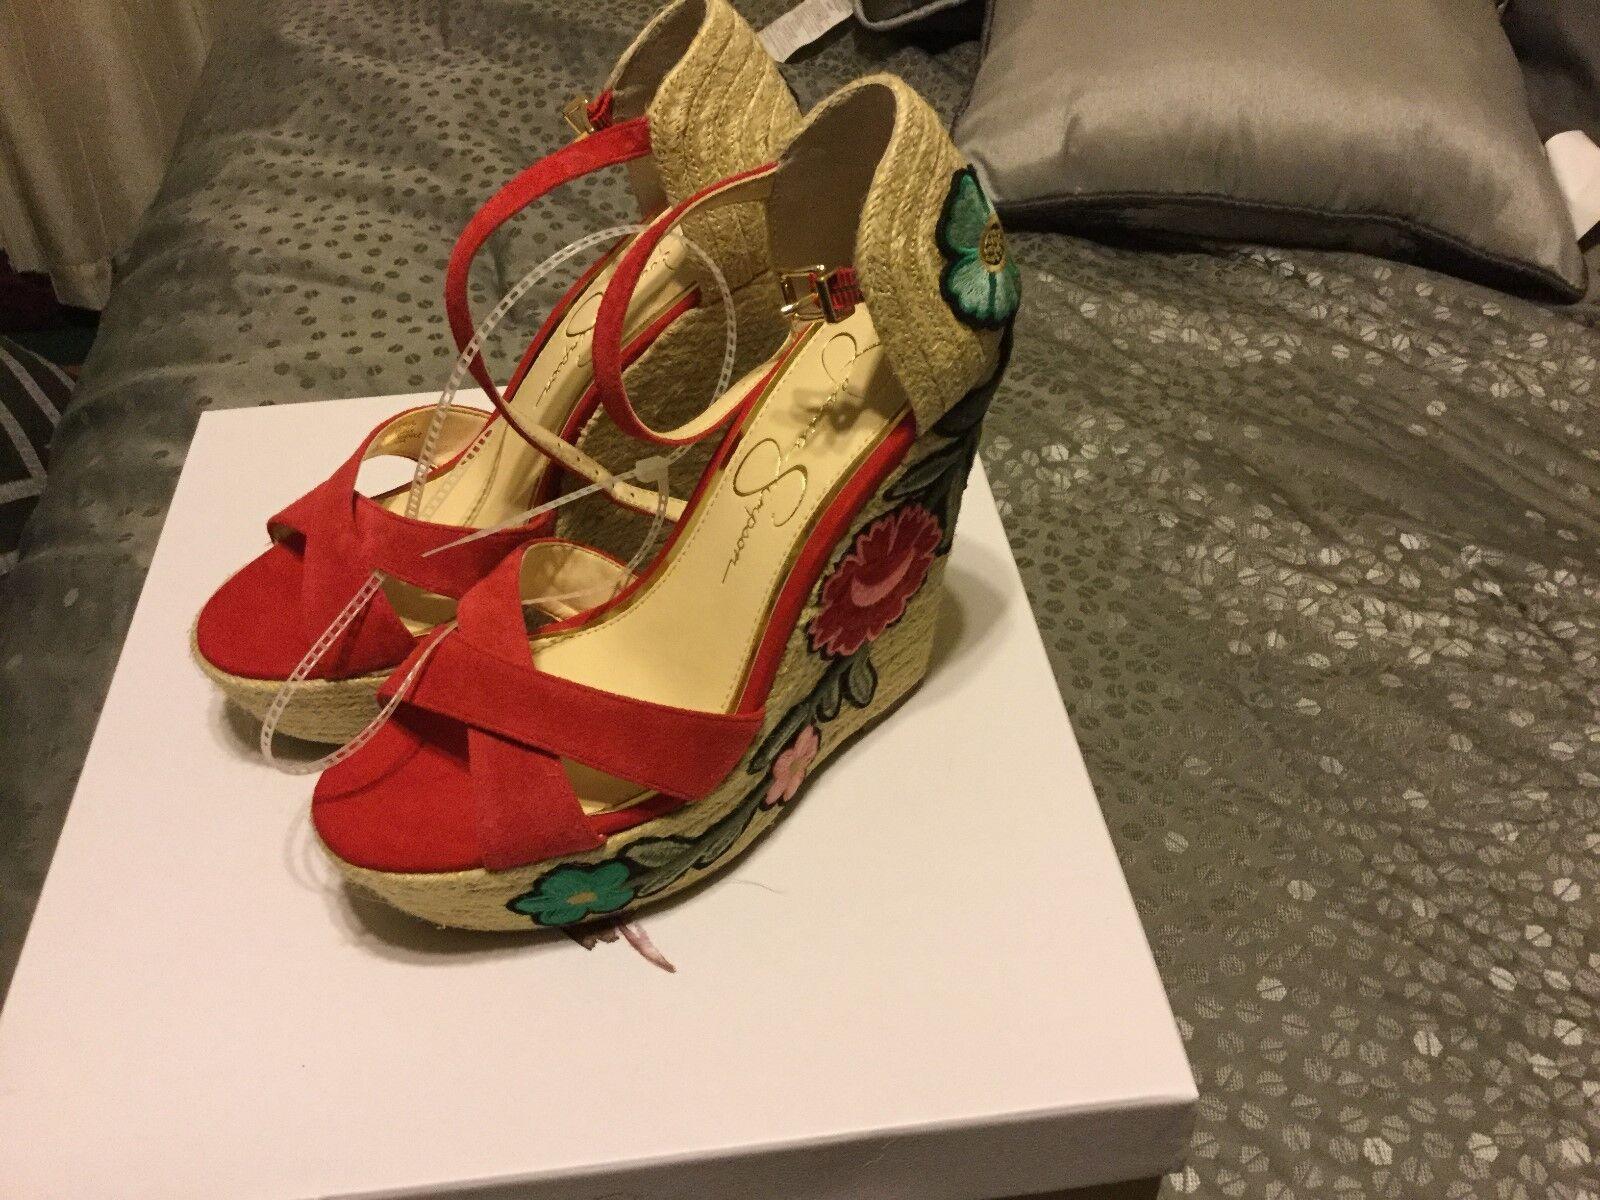 Nuevo (tamaño con etiquetas Sandalias de Jessica Simpson Appella Gamuza (tamaño Nuevo 6 1 2) 321404